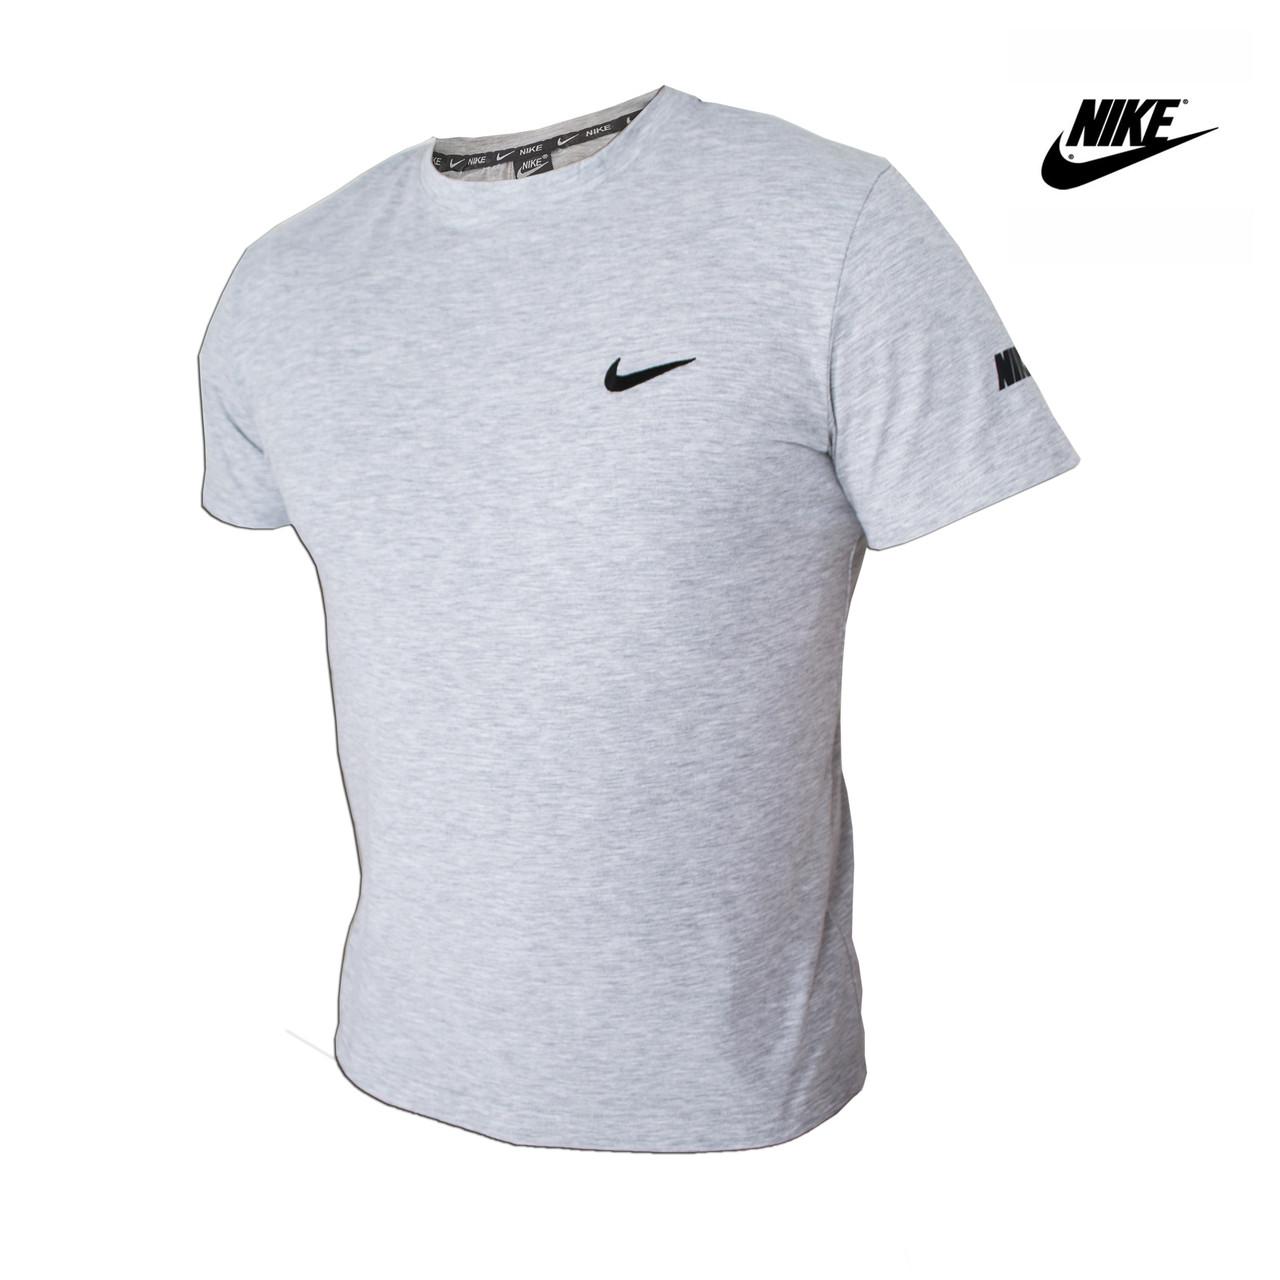 Мужская футболка. Реплика NIKE. Мужская одежда